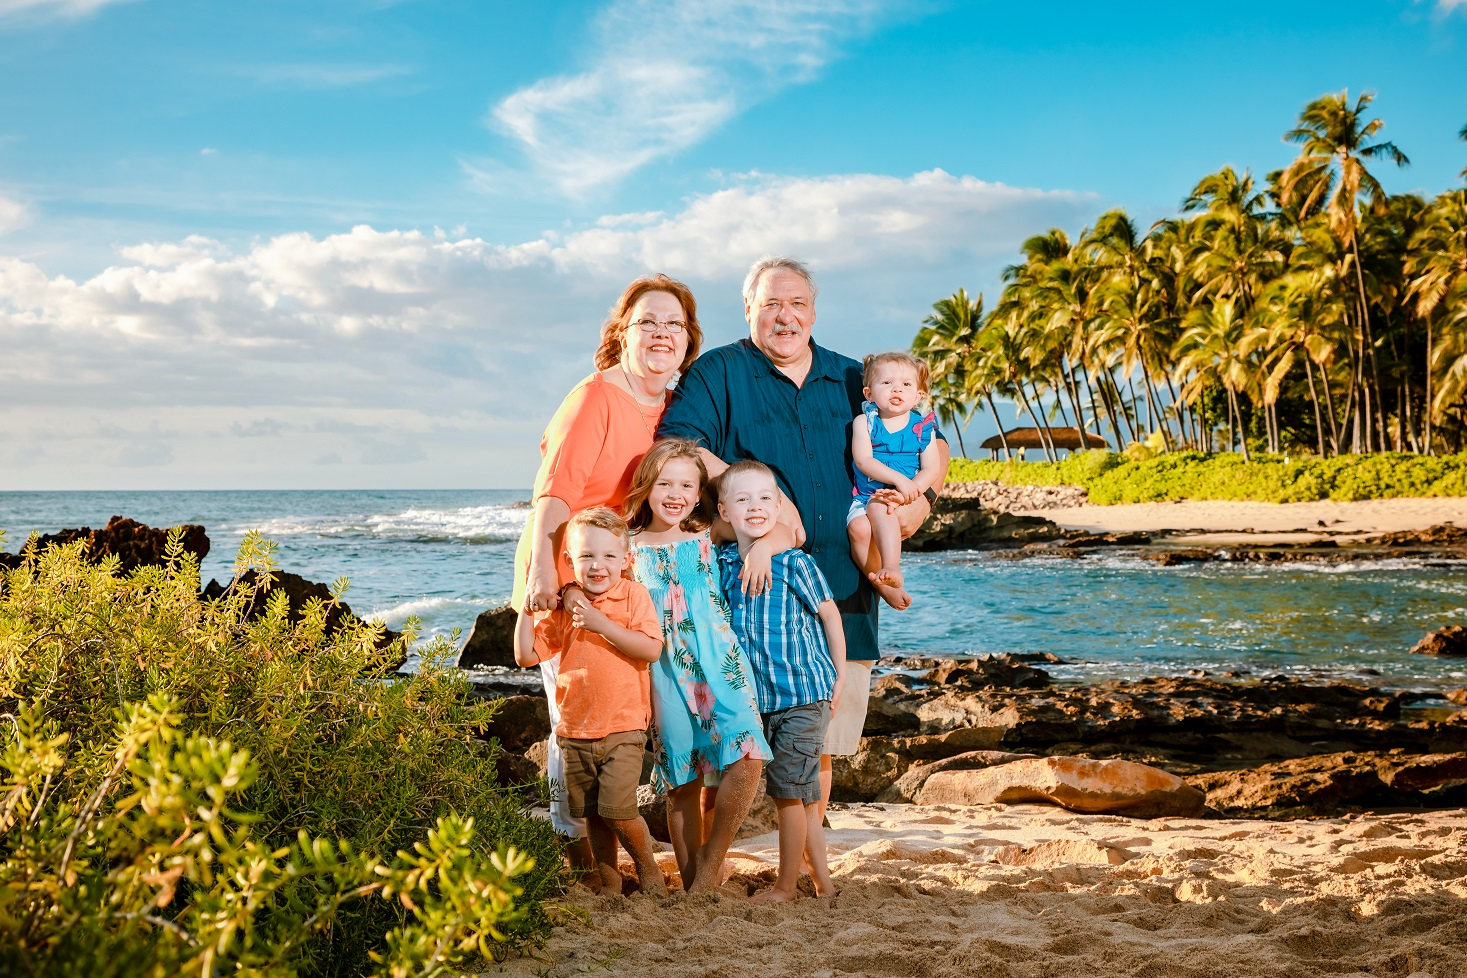 Oahu2018-48401.jpg